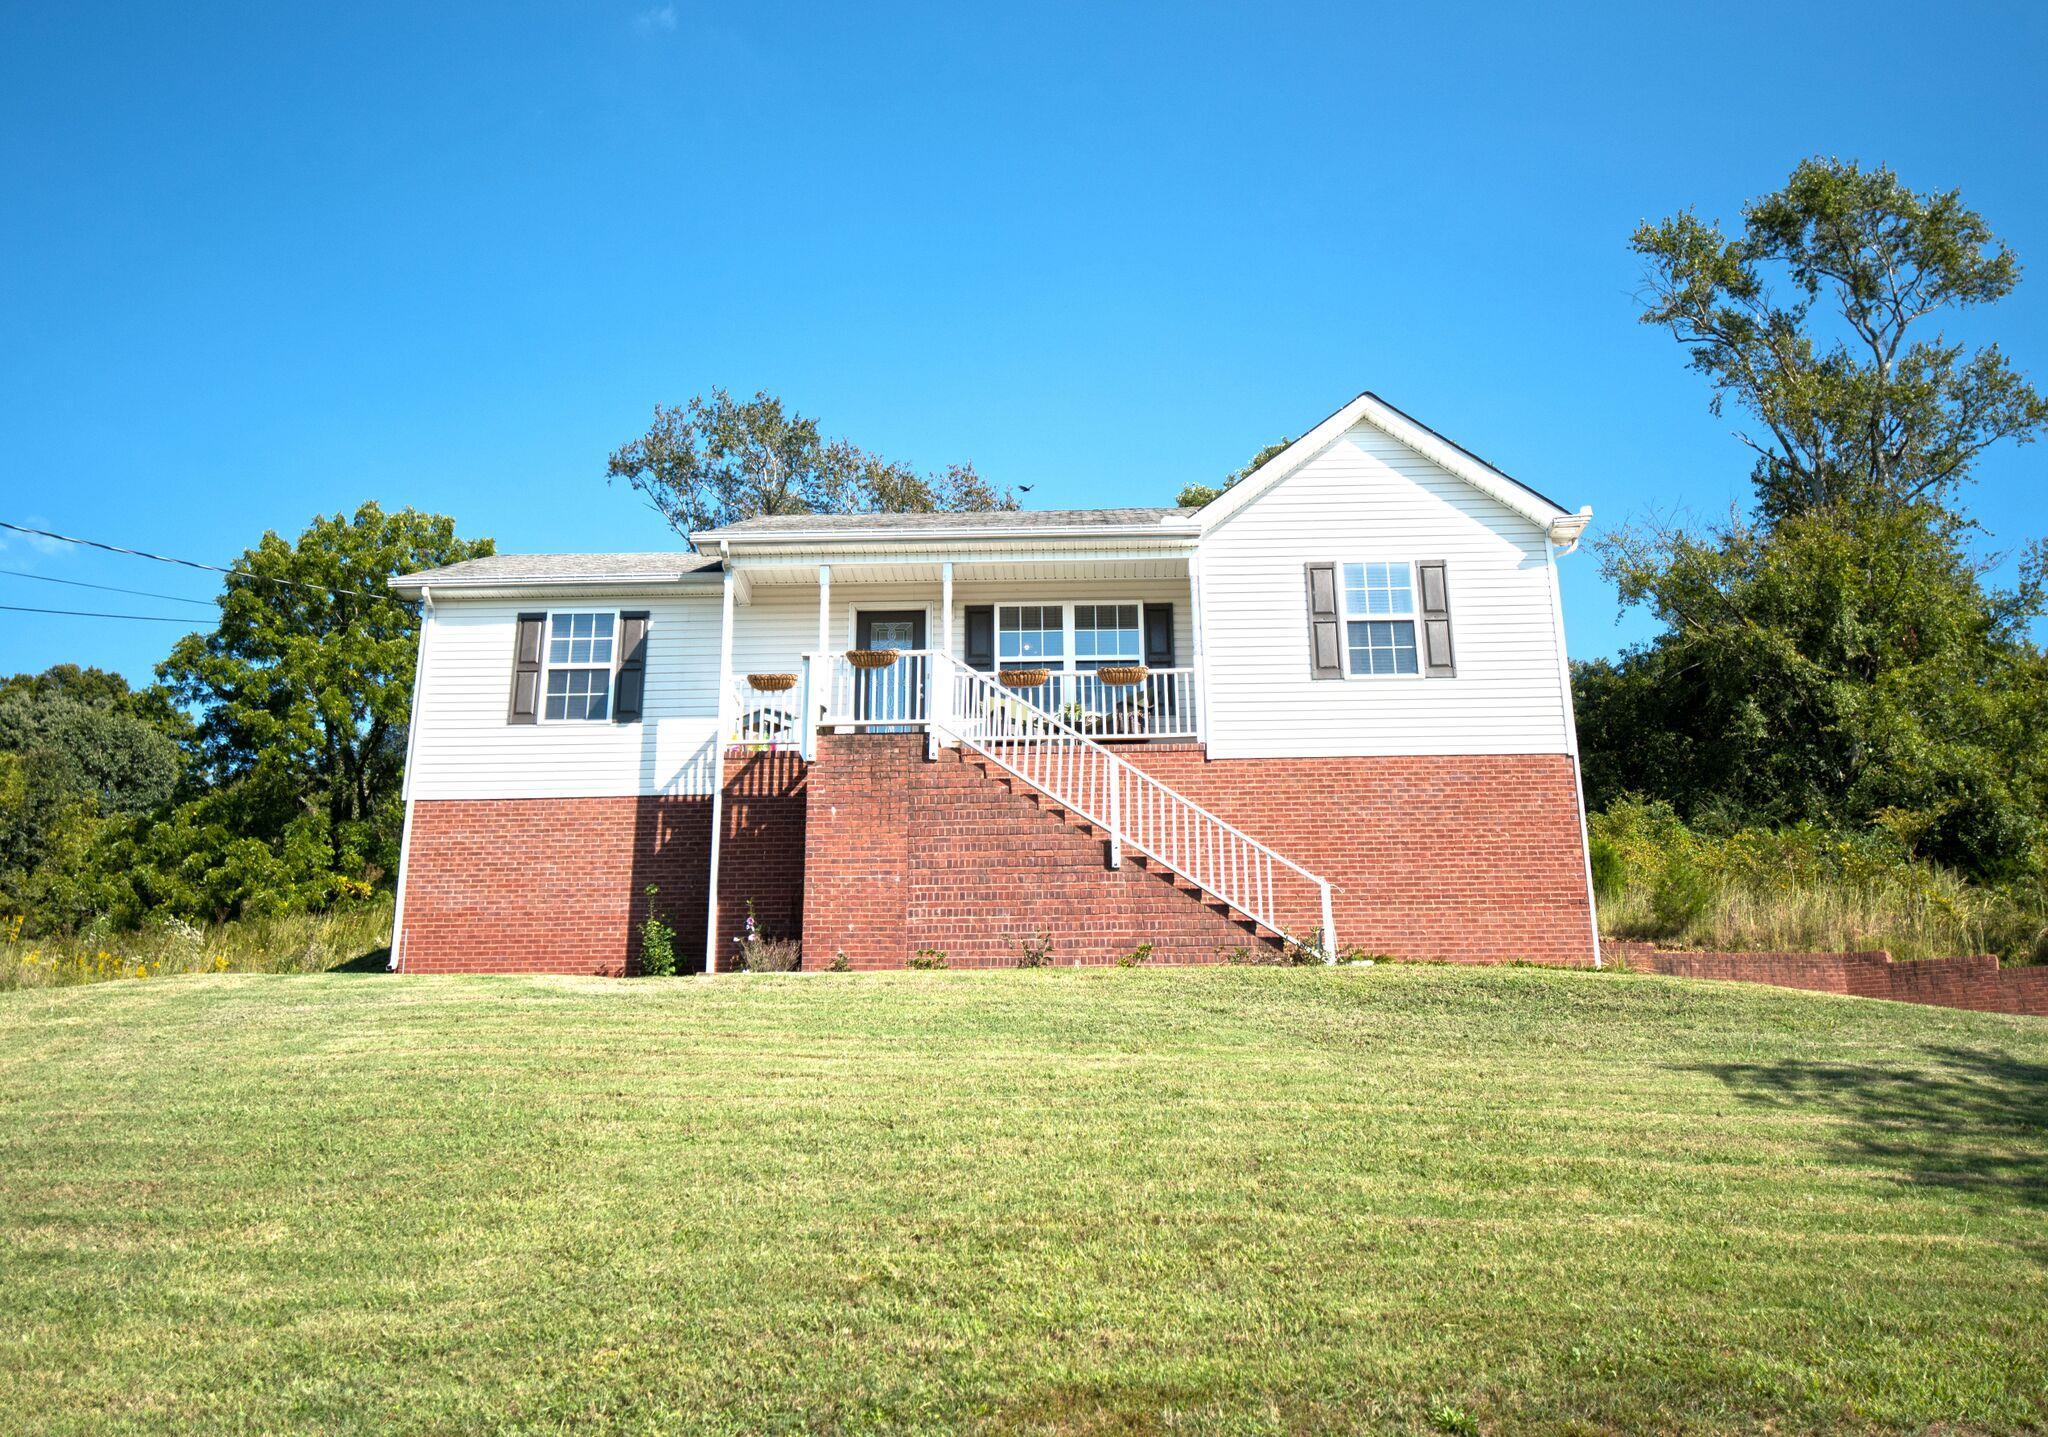 117 Fort Cir, Wartrace, TN 37183